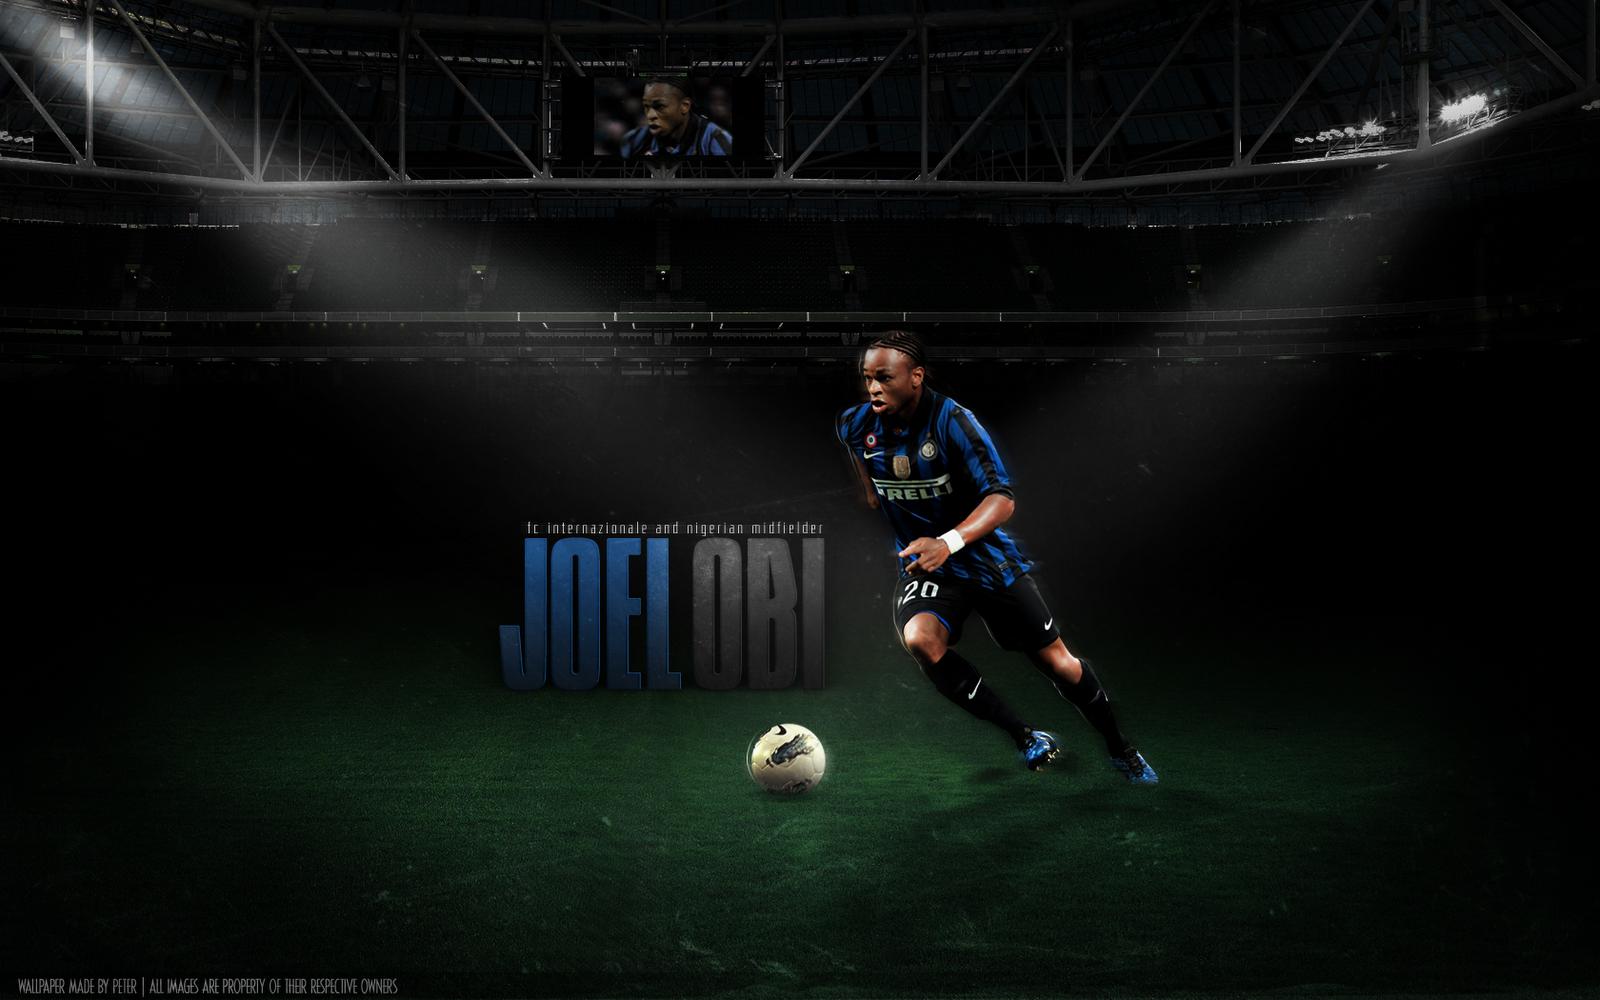 Football Wallpapers&Football-Avatars: Wallpaper-Joel Obi